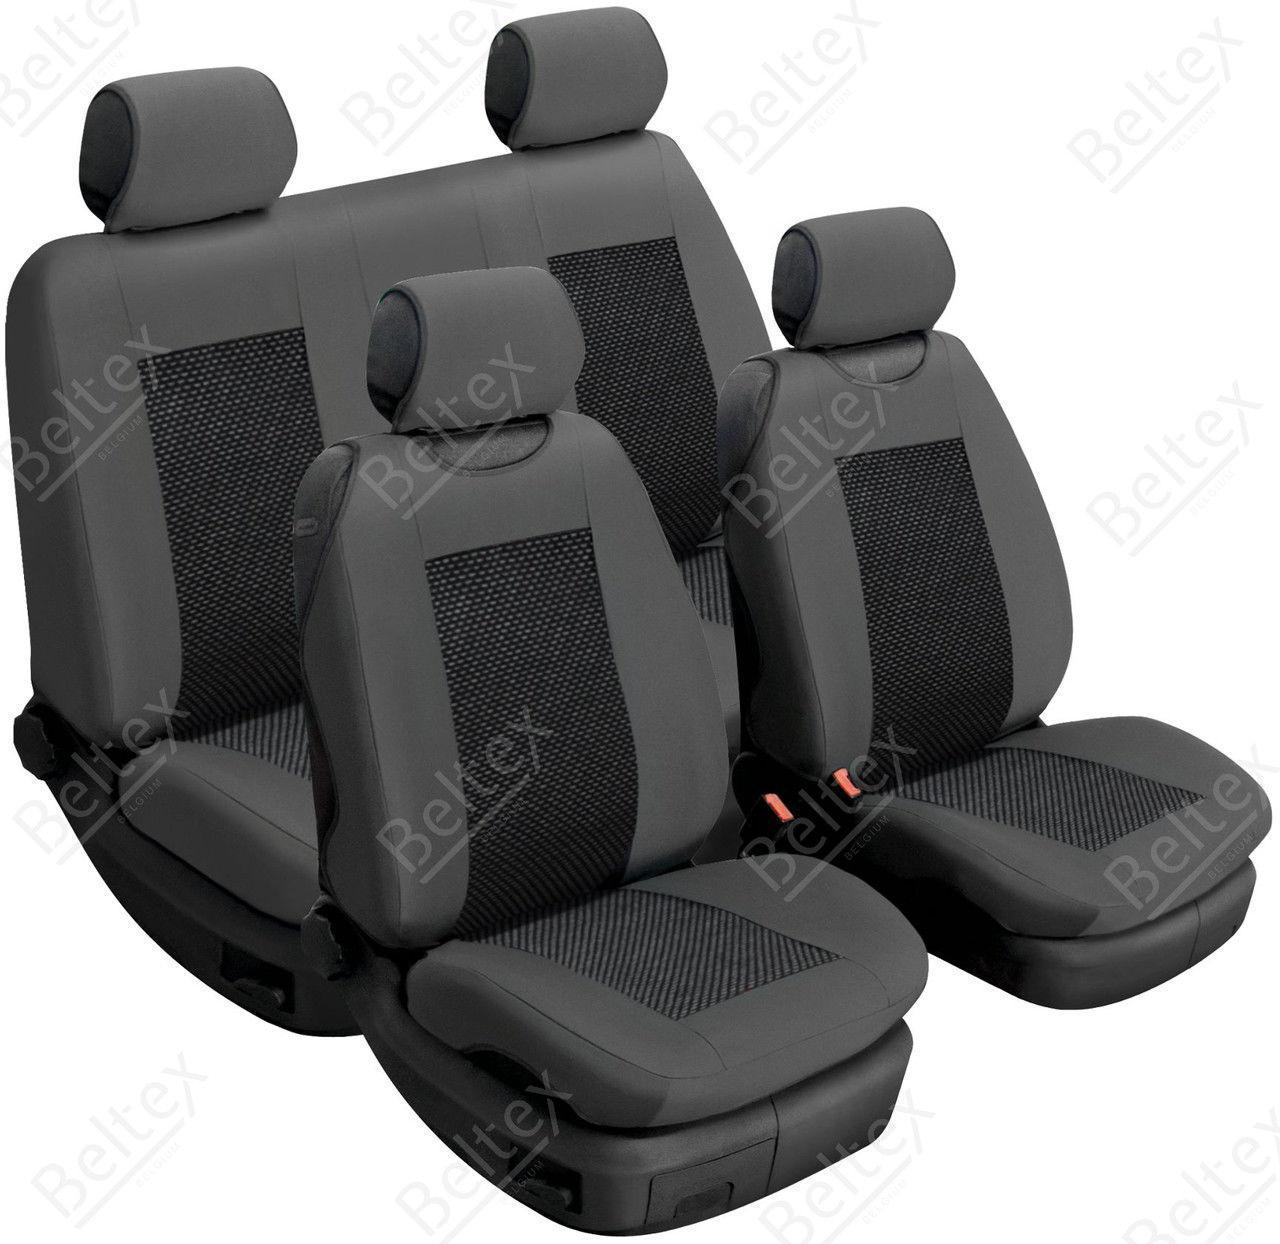 Майки/чехлы на сиденья Опель Кадет Е (Opel Kadett E)